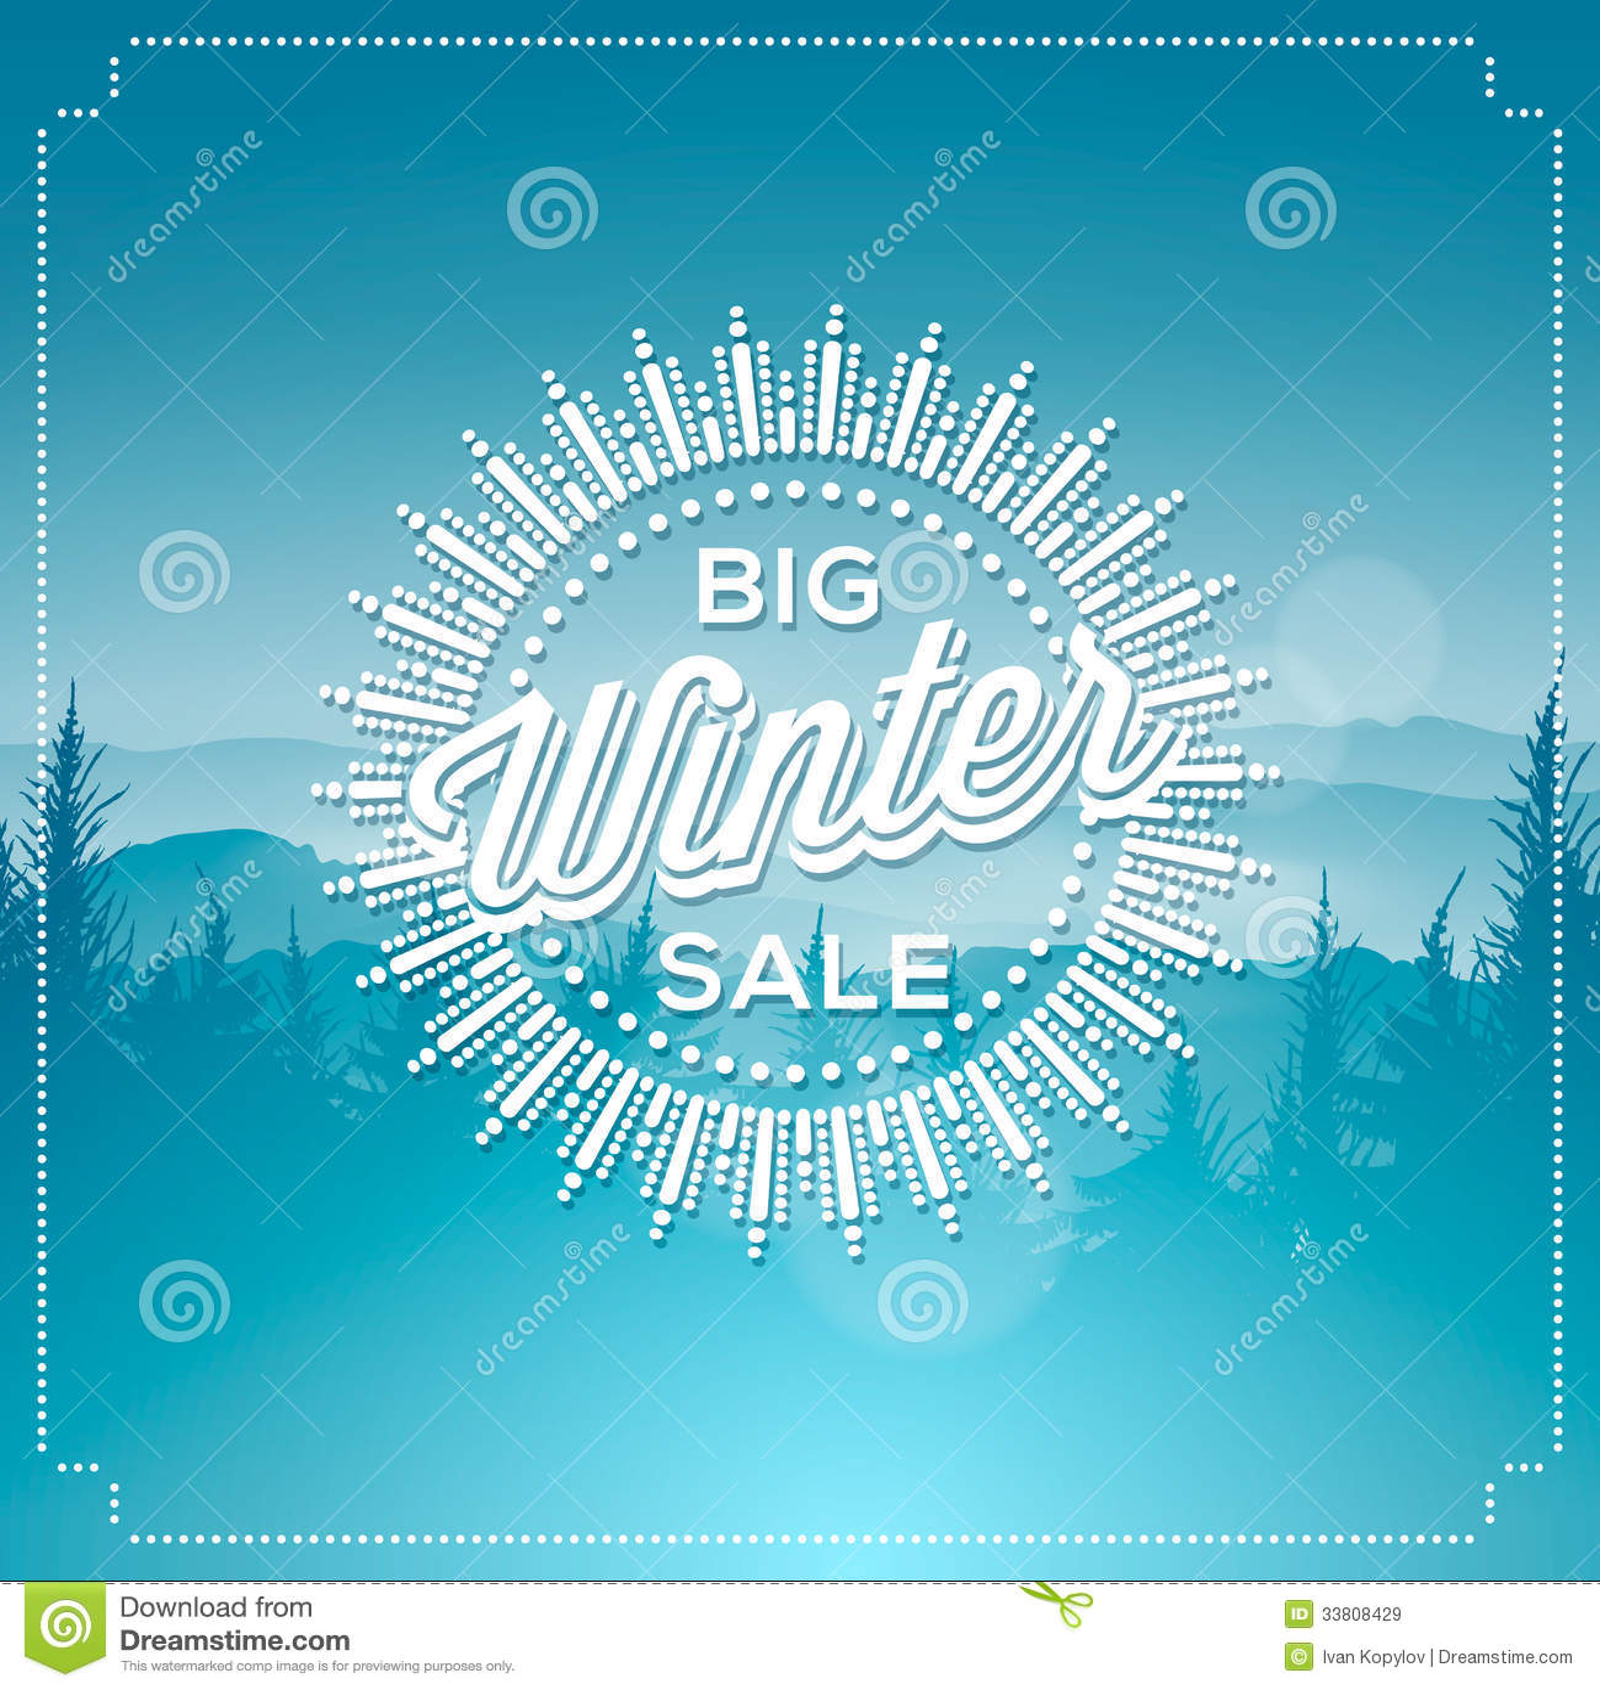 Big winter sale poster stock illustration. Image of